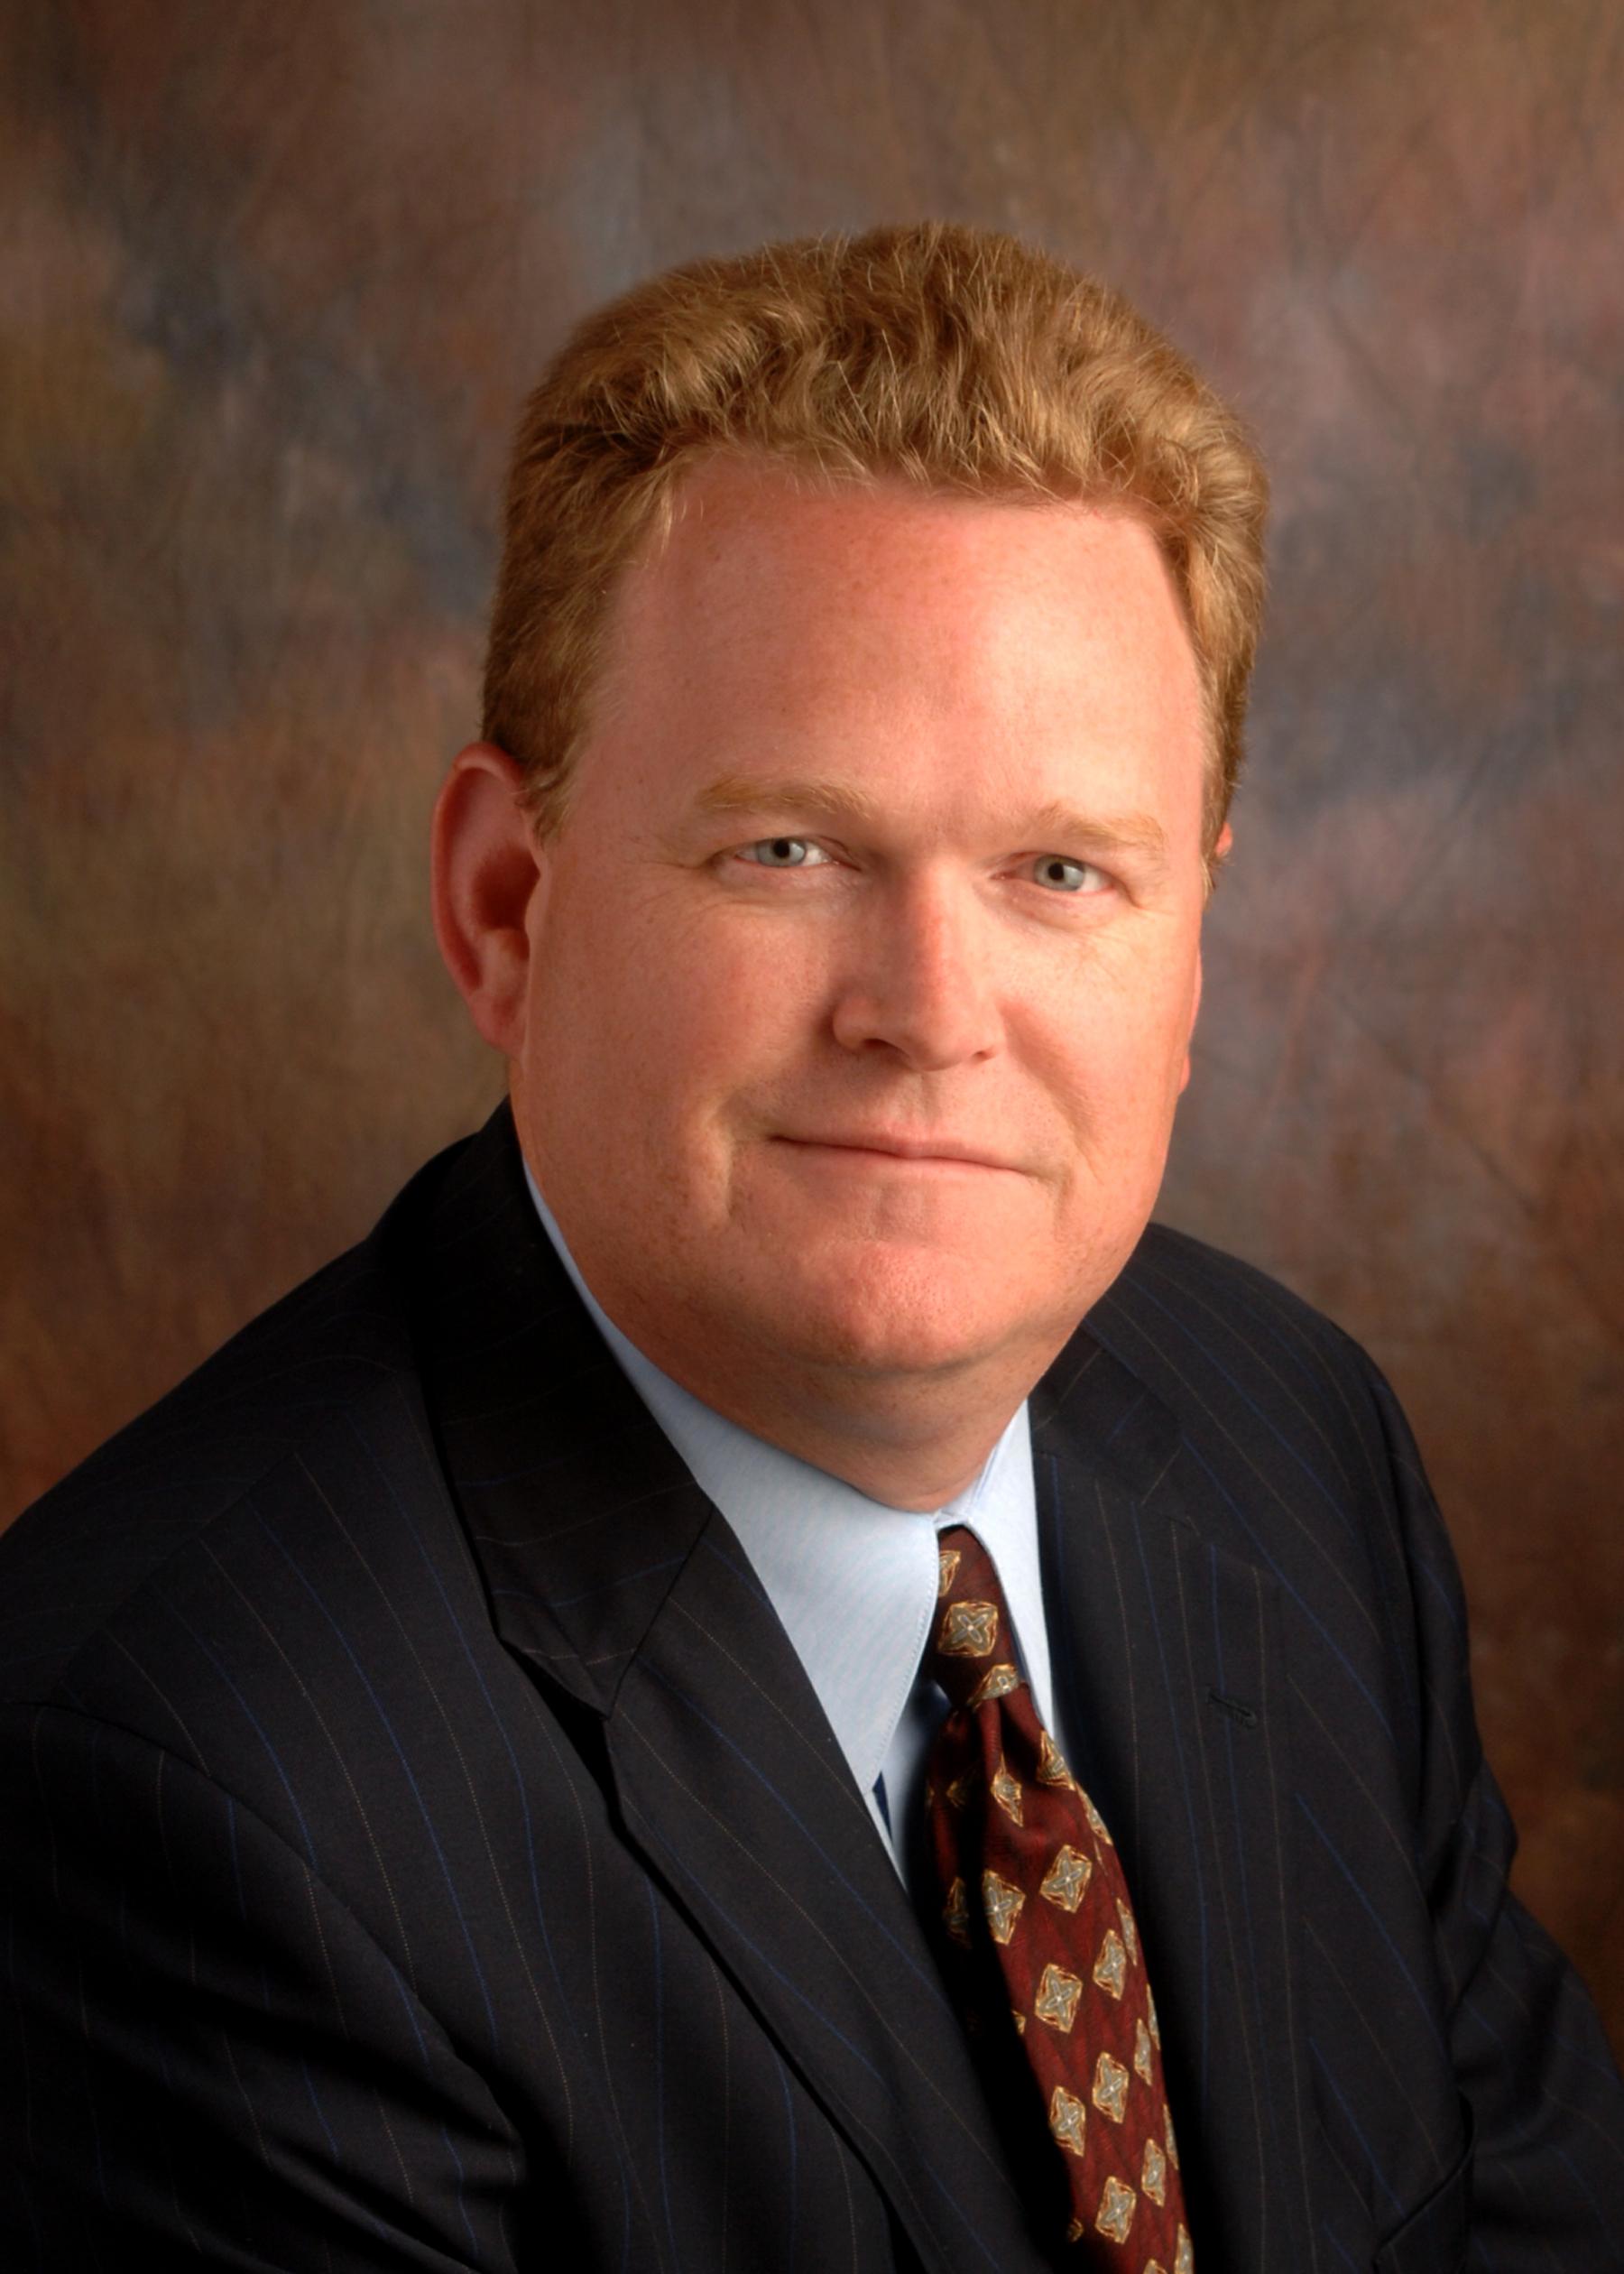 Texas Bail Legislation Awaits Governor's Signature – California SB 262 Pending